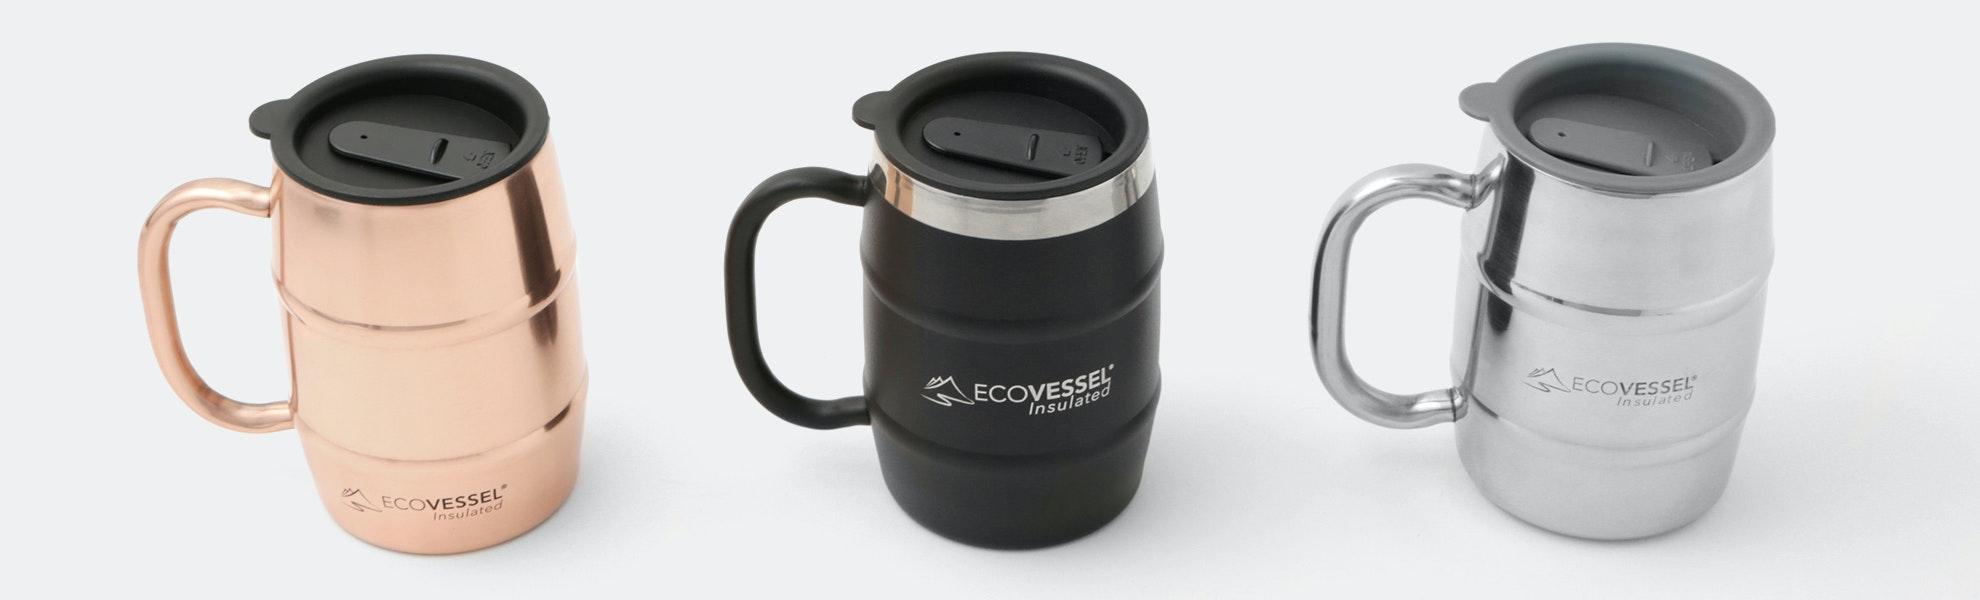 EcoVessel Double Barrel 16 oz Mug (2-Pack)